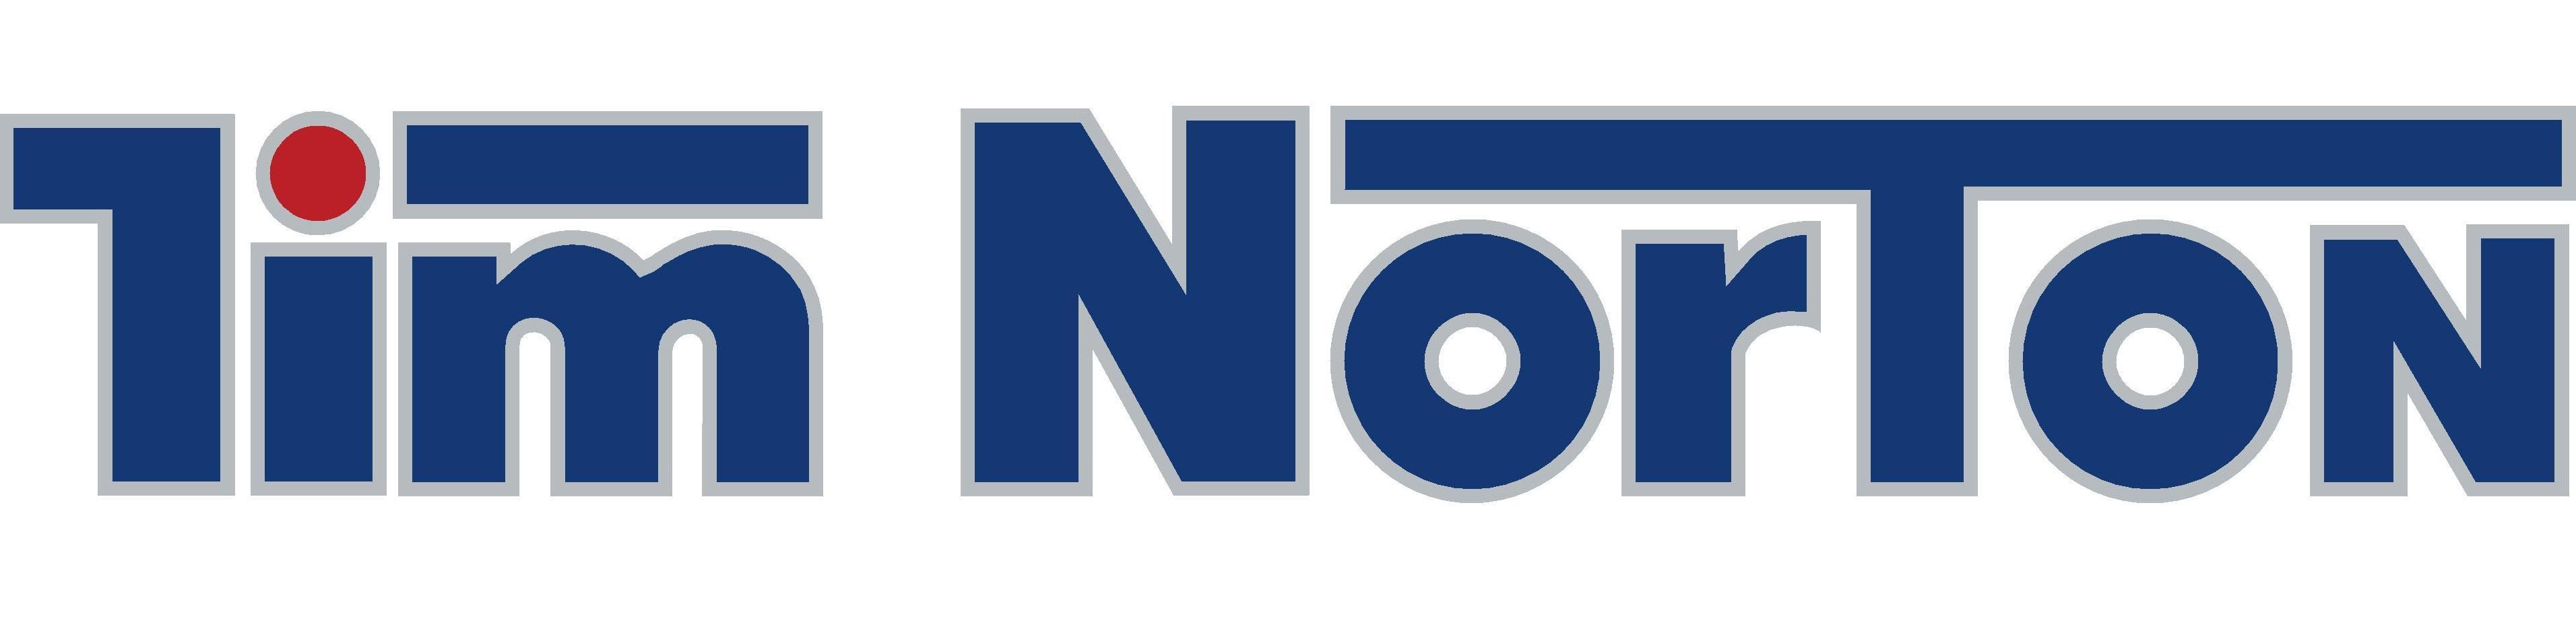 logo1 tim nortons solo